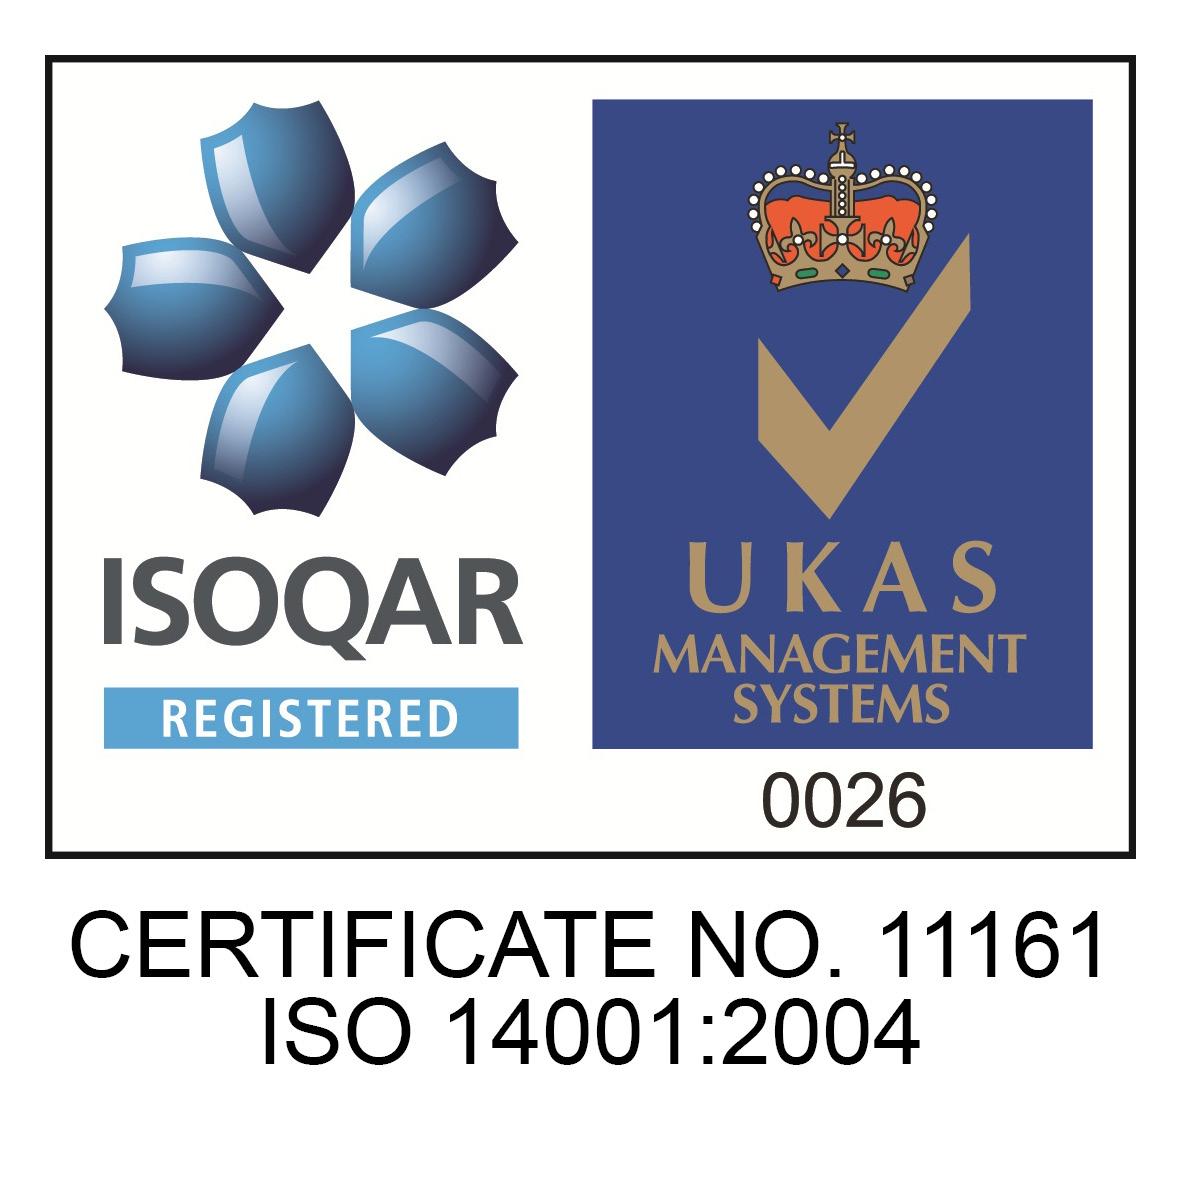 UKAS ISOQAR LOGO 14001